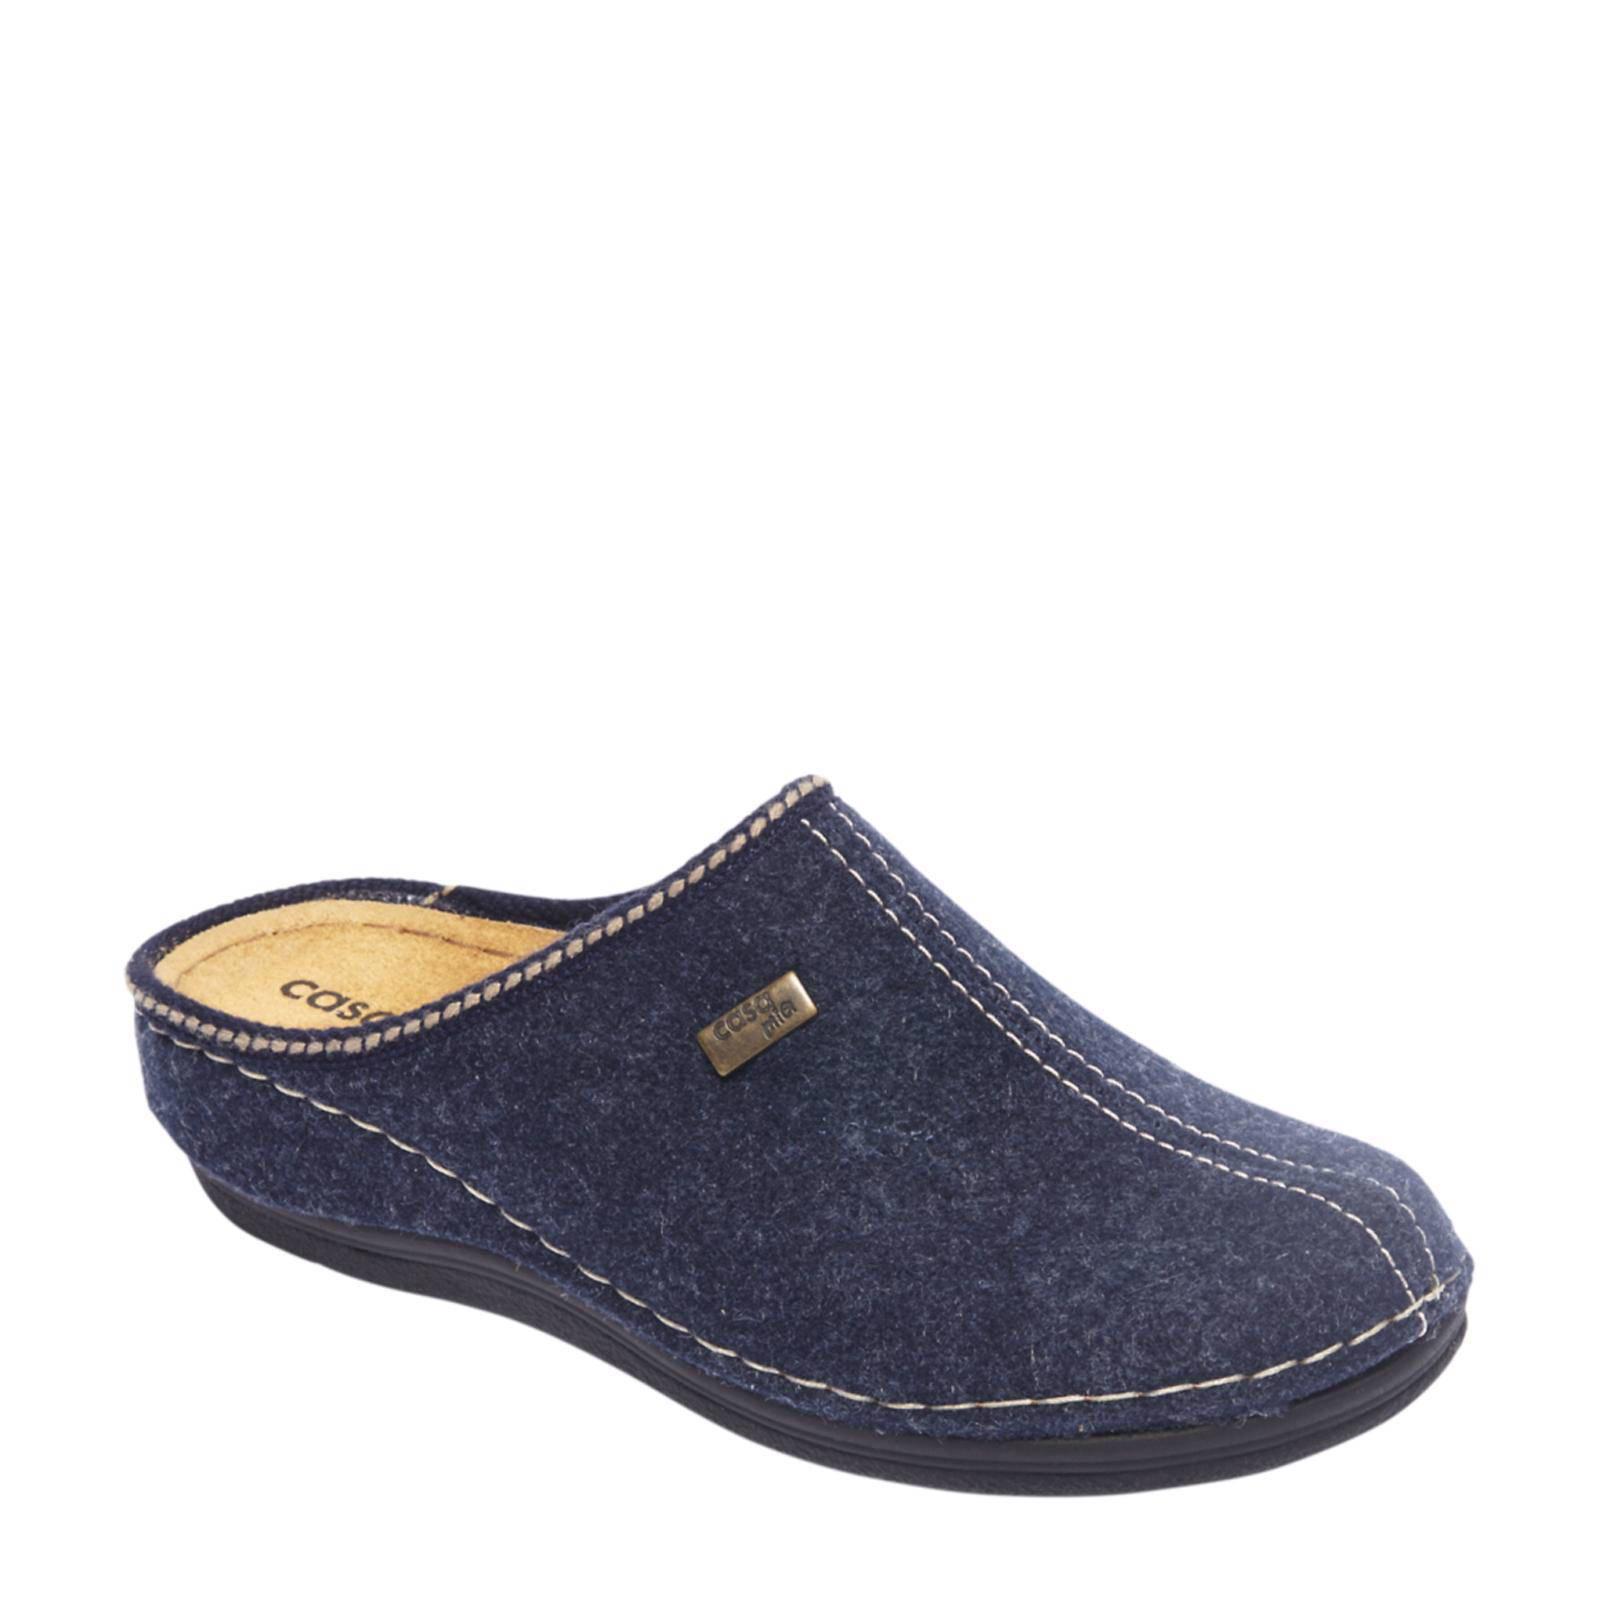 Chaussures Bleu Casa Mia hmn8wO